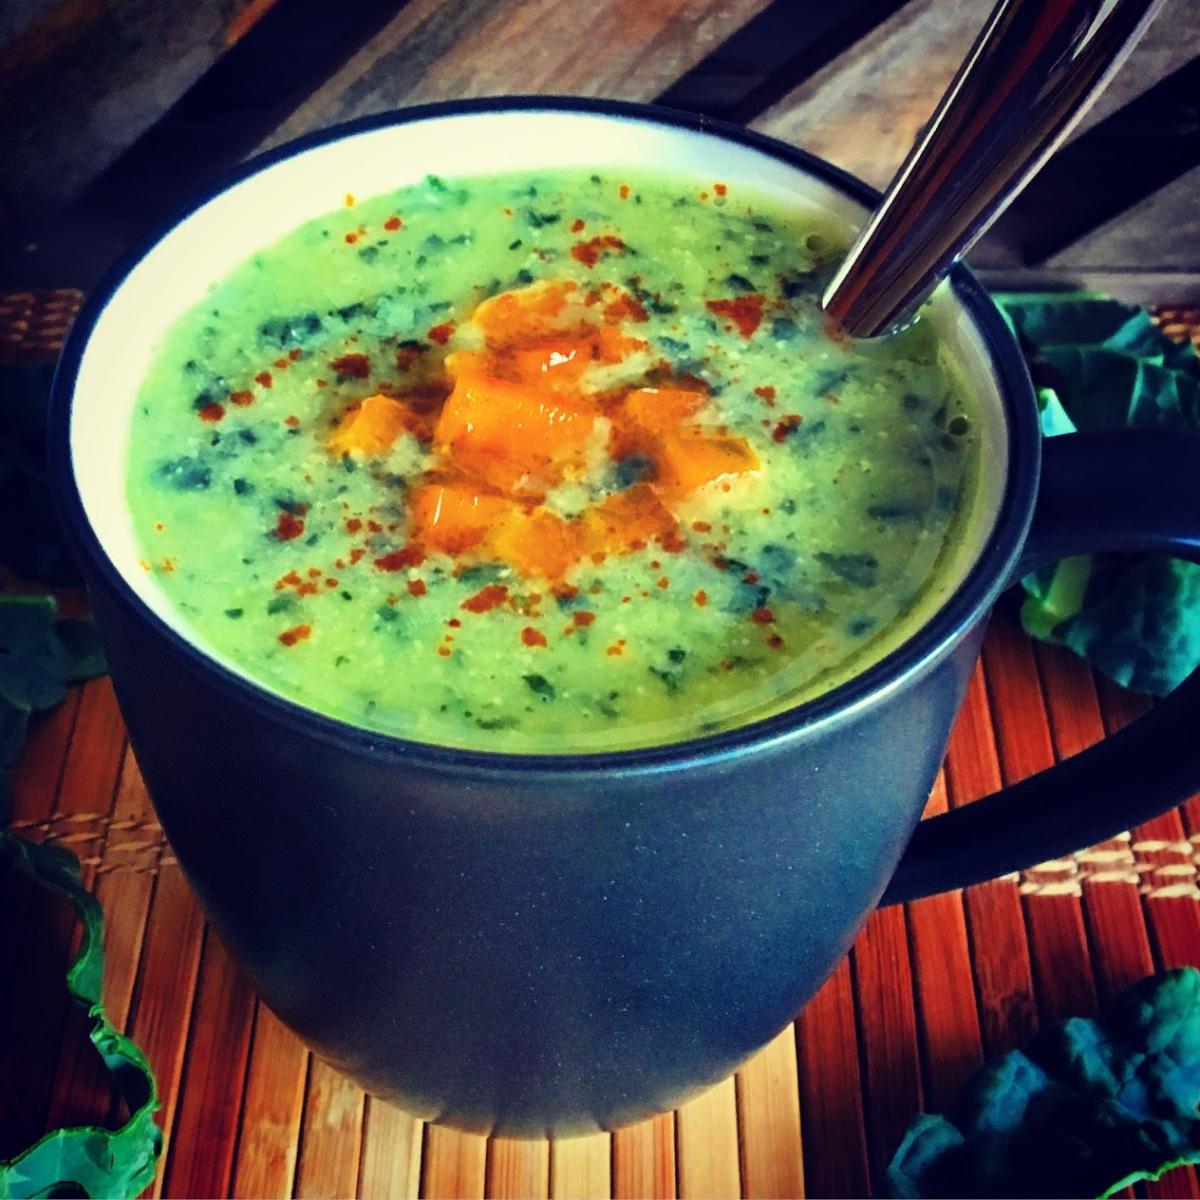 Creamy Kale & Parsnip Soup